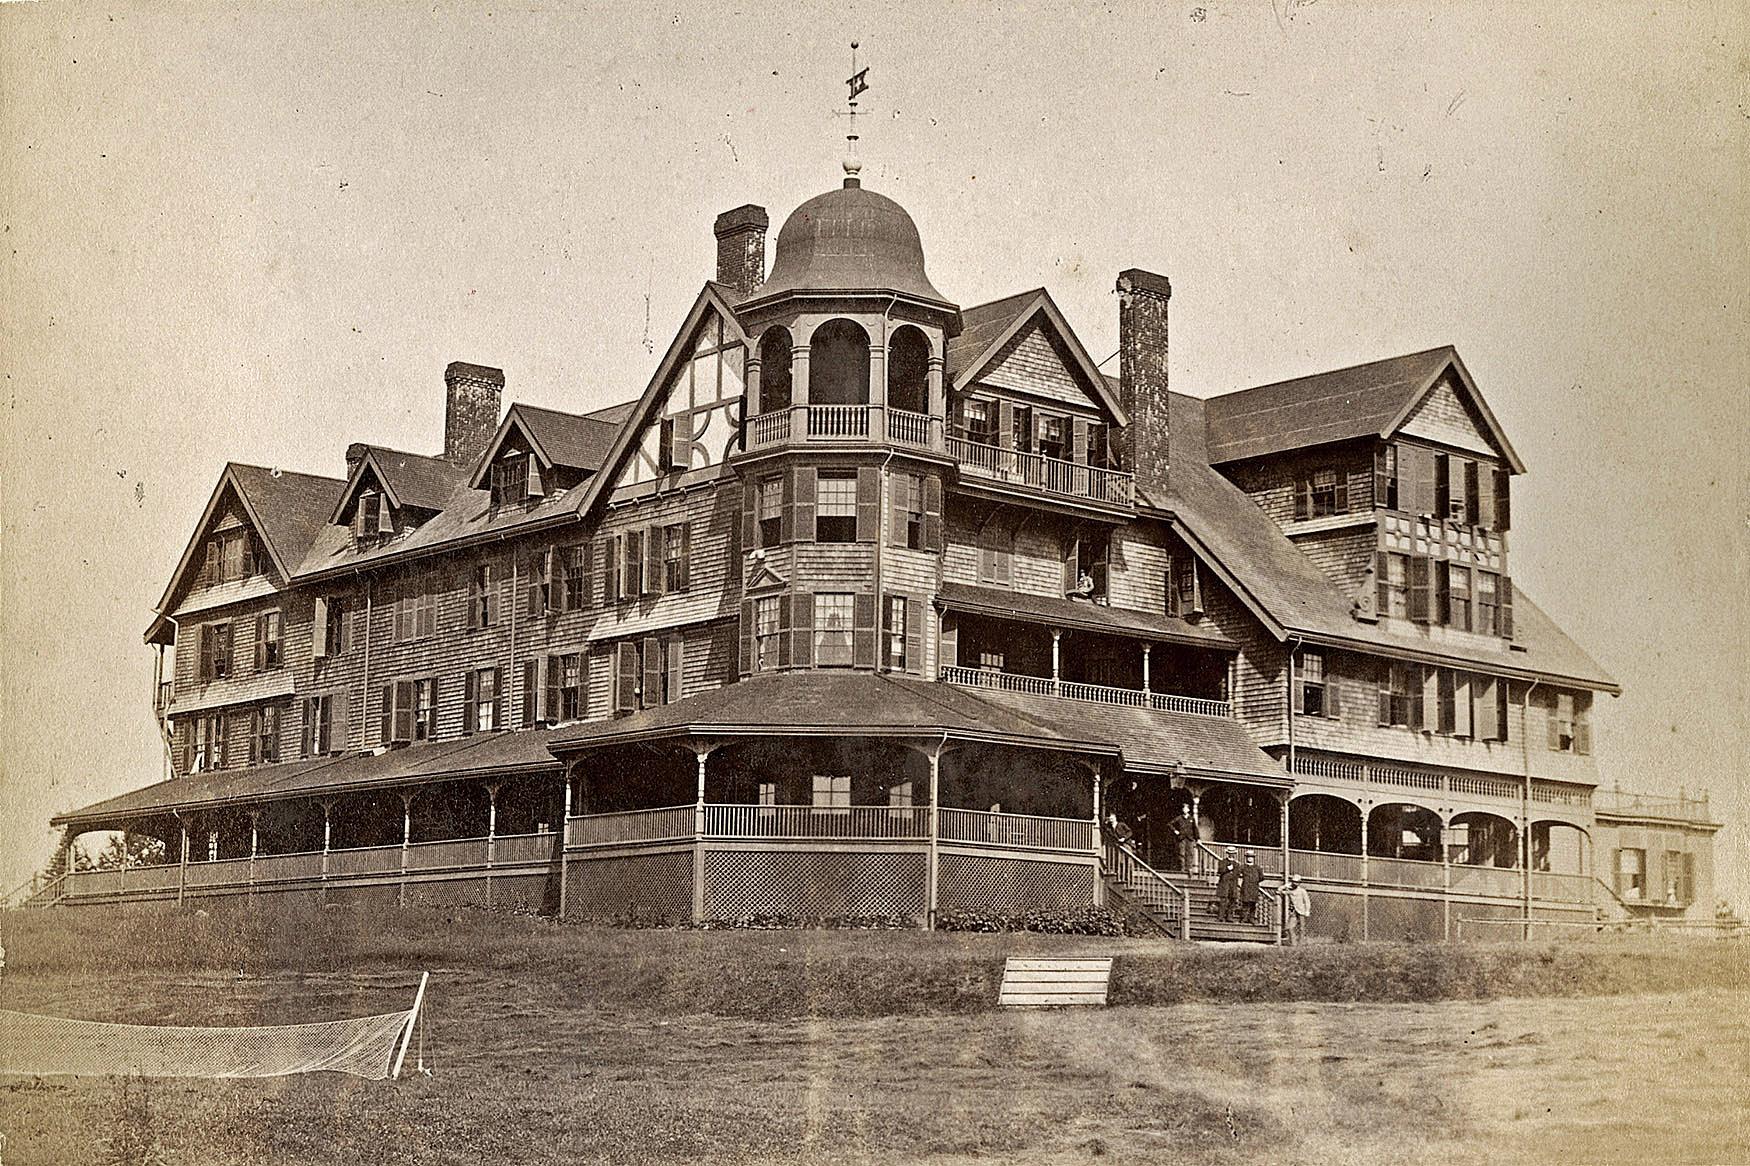 Tyn Y Coed Hotel Campobello Island New Brunswick